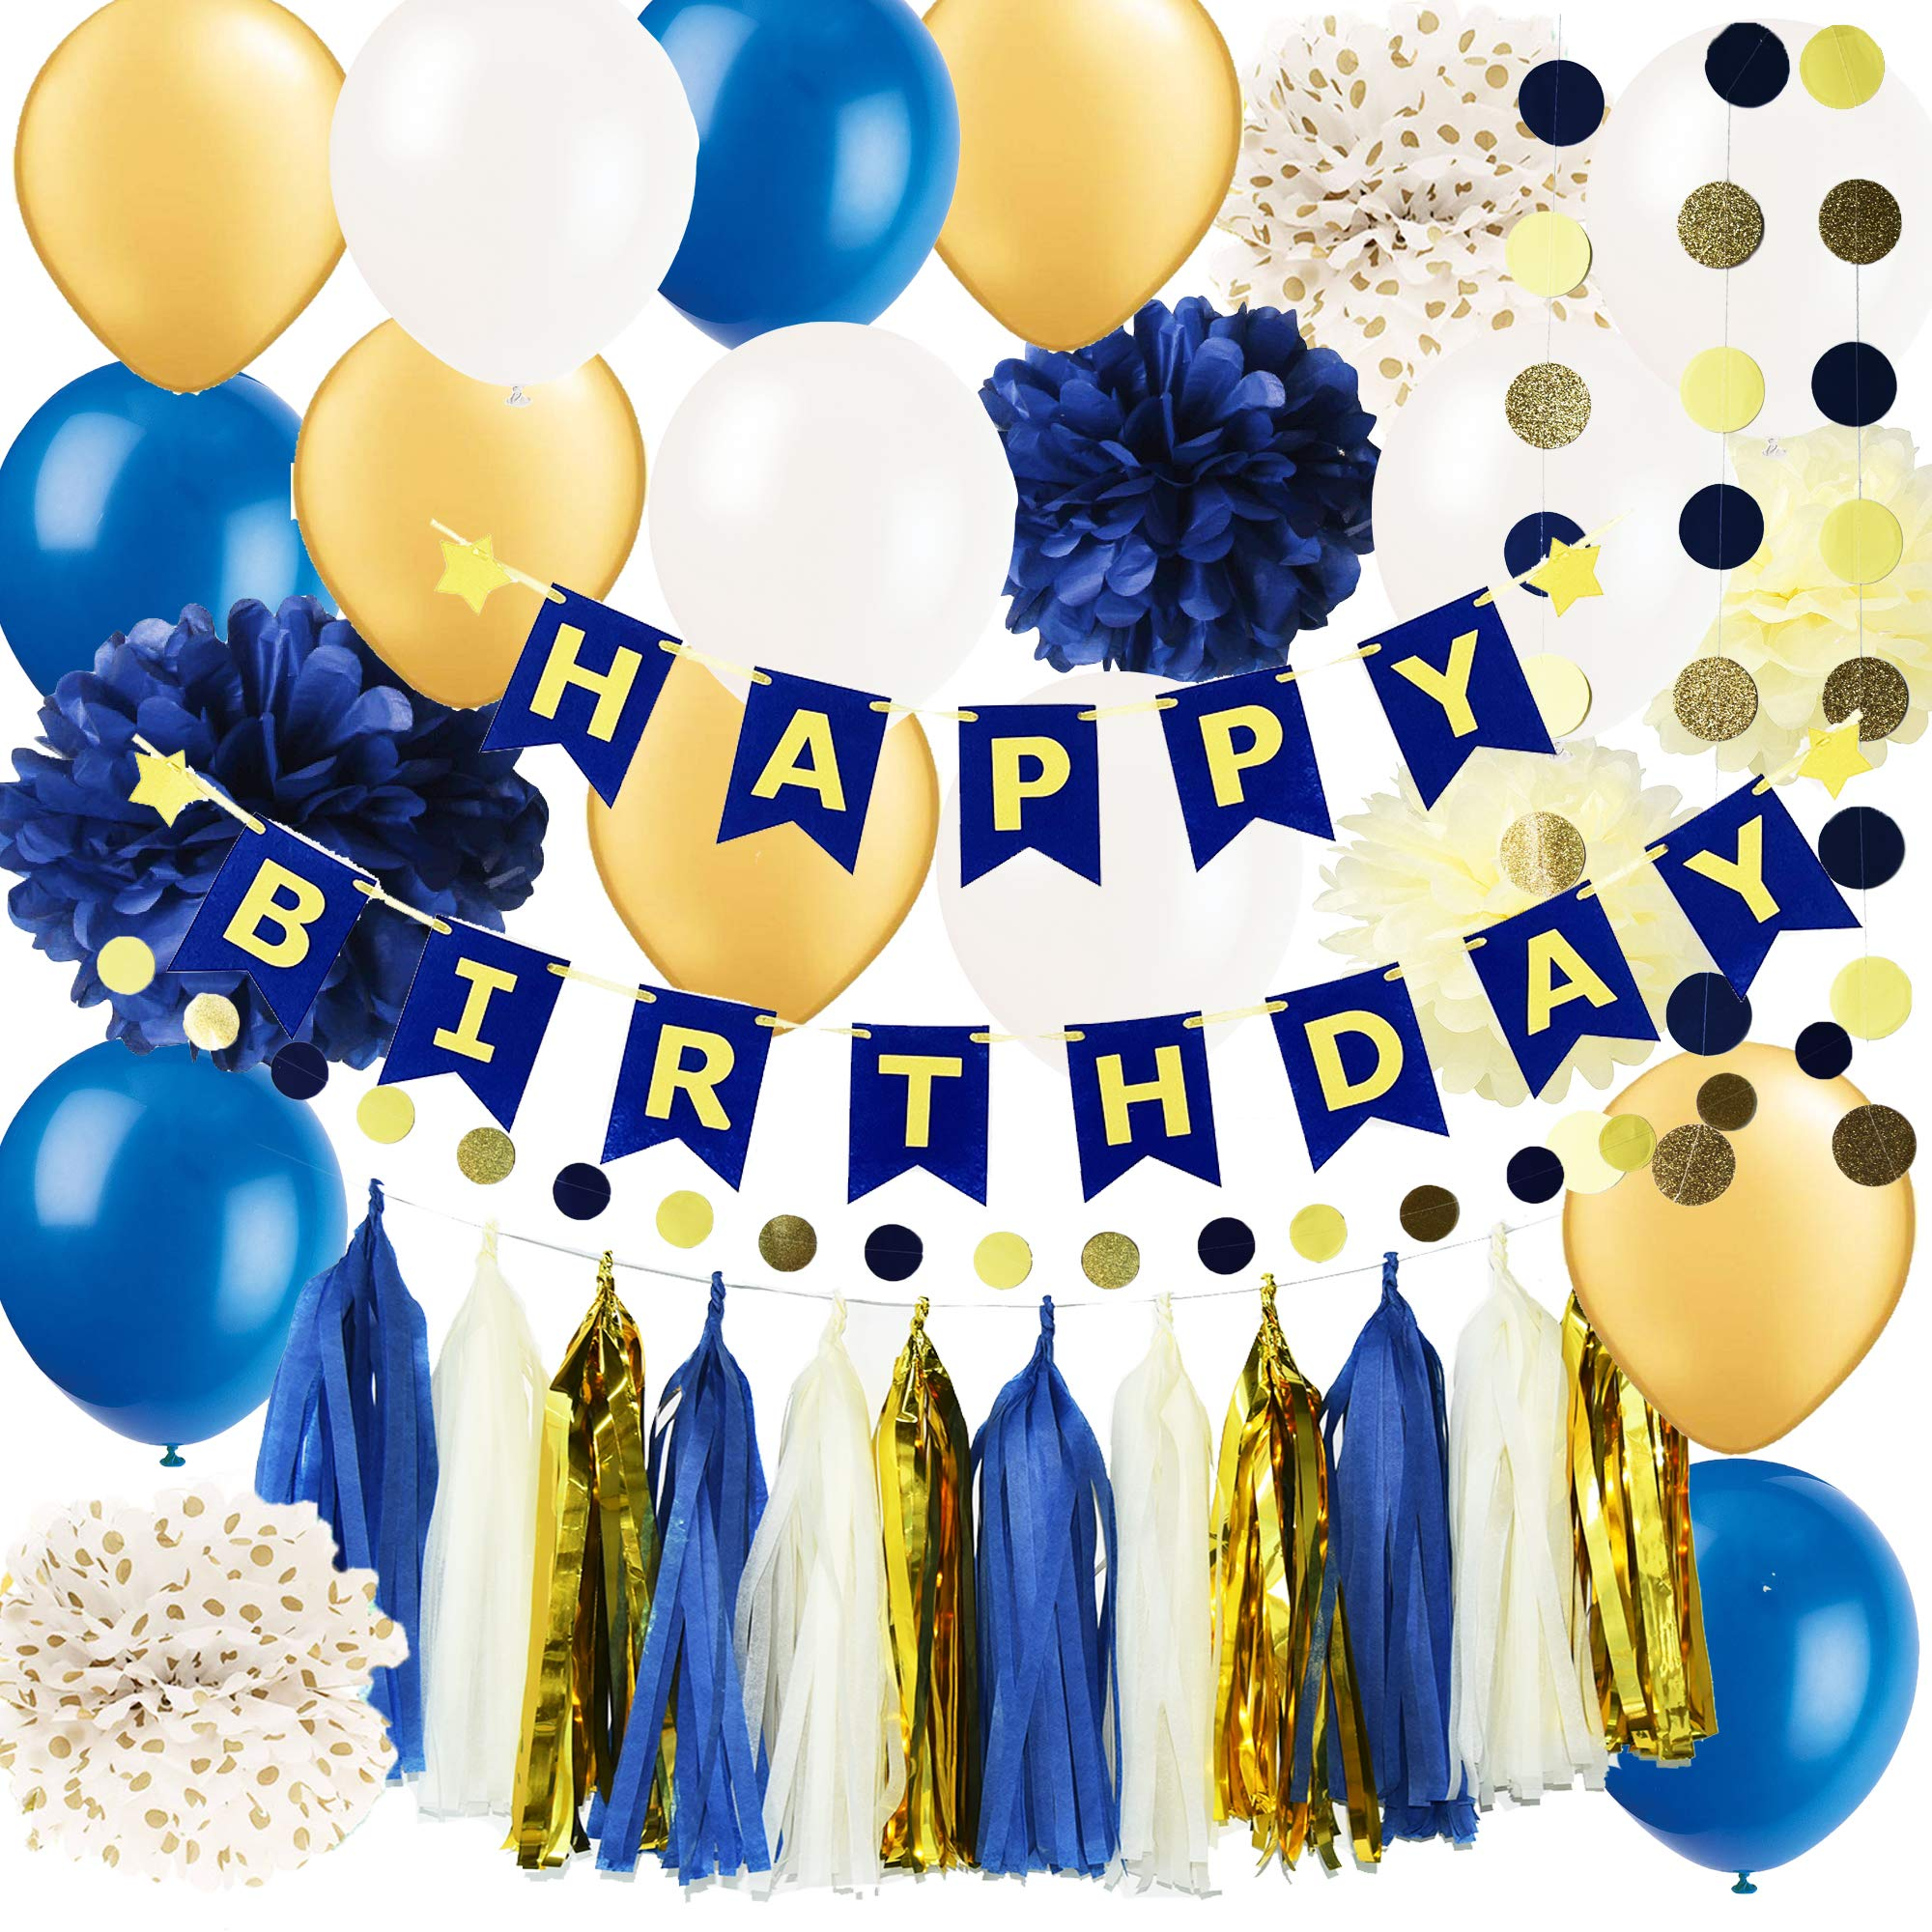 Royal Pince Birthday Party Decorations/Navy Gold Happy Birthday Banner Latex Ballons Polka Dot Tissue Poms for Navy and Gold Birthday Banner, Happy Birthday, 50th Birthday, Adult Birthday